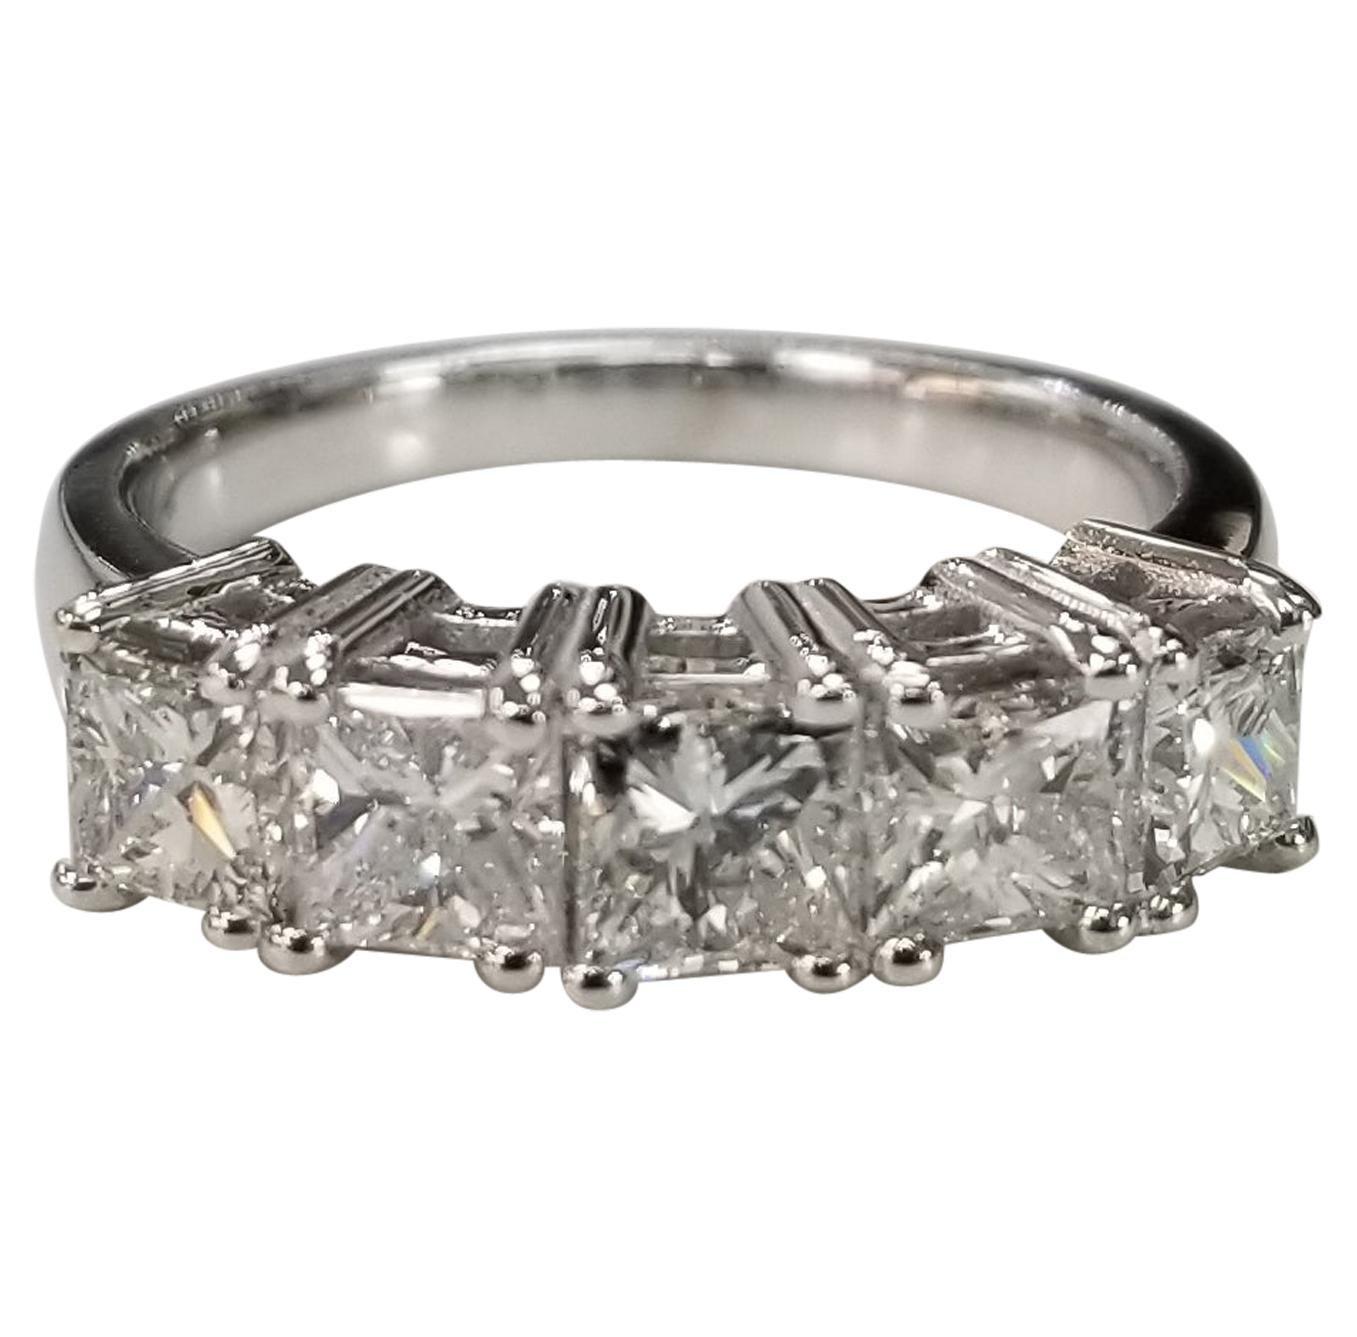 14 Karat White Gold 5 Princess Cut Diamonds Anniversary Wedding Ring